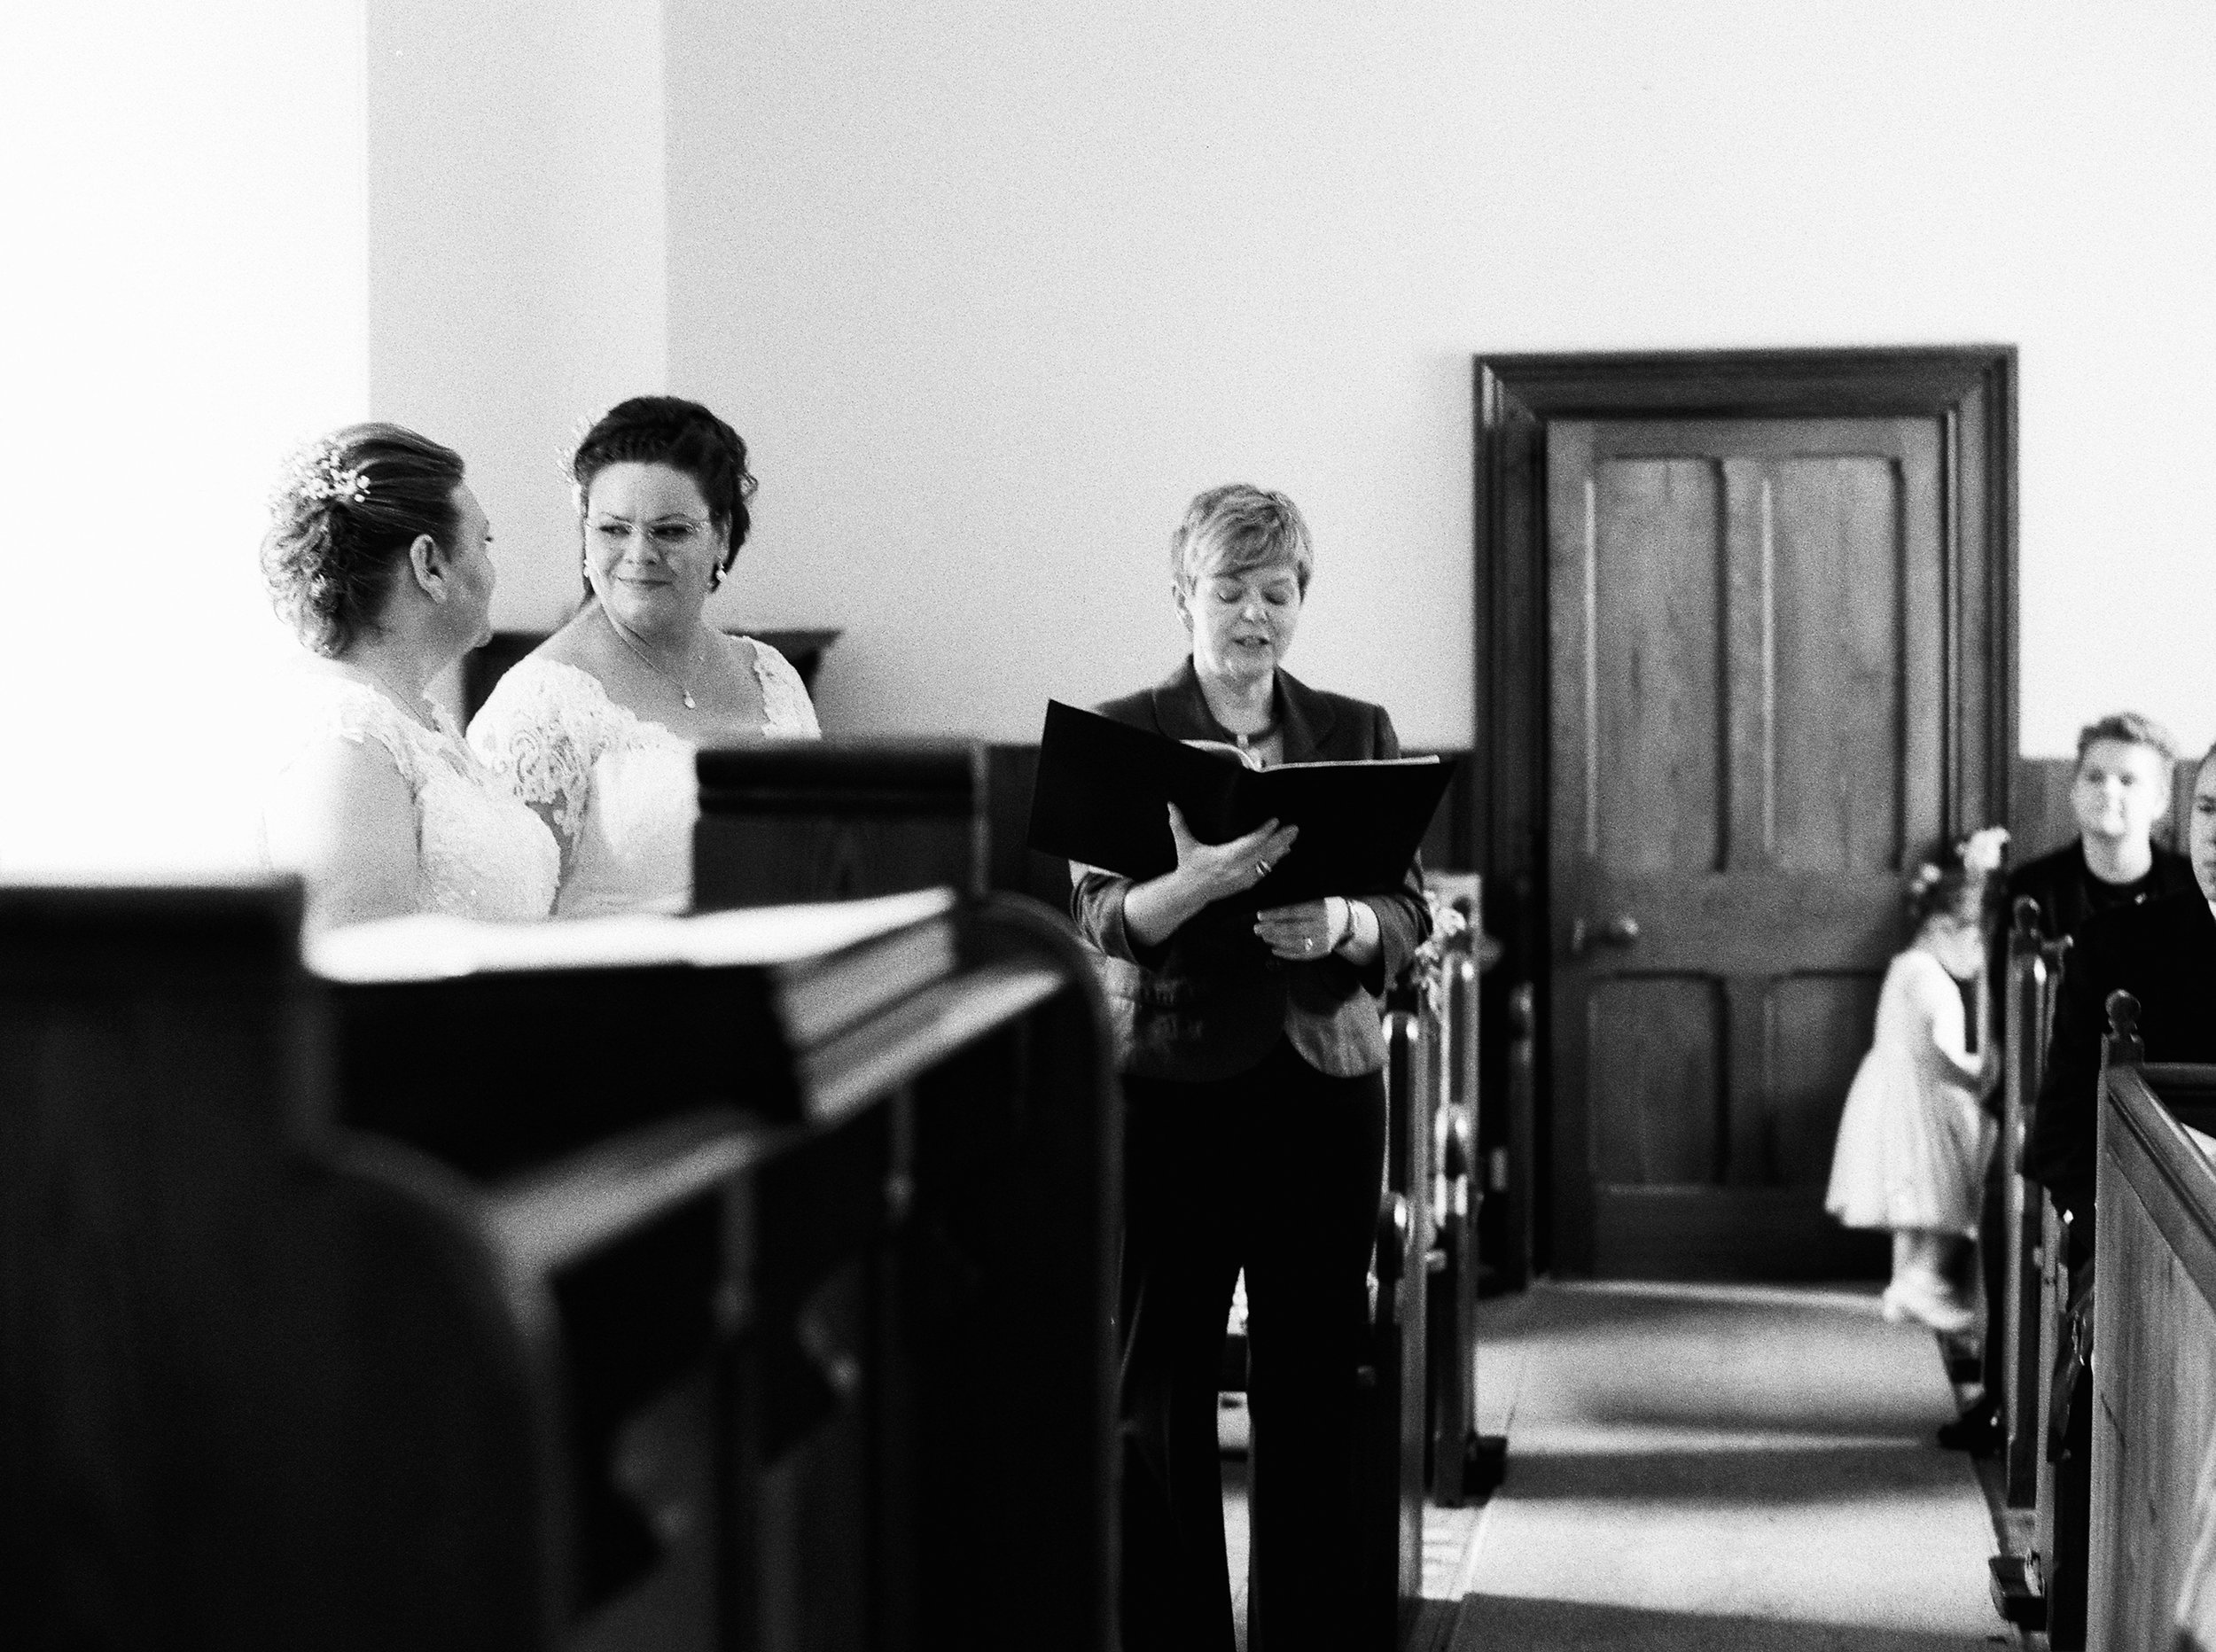 wedding-photography-scotland128.jpg